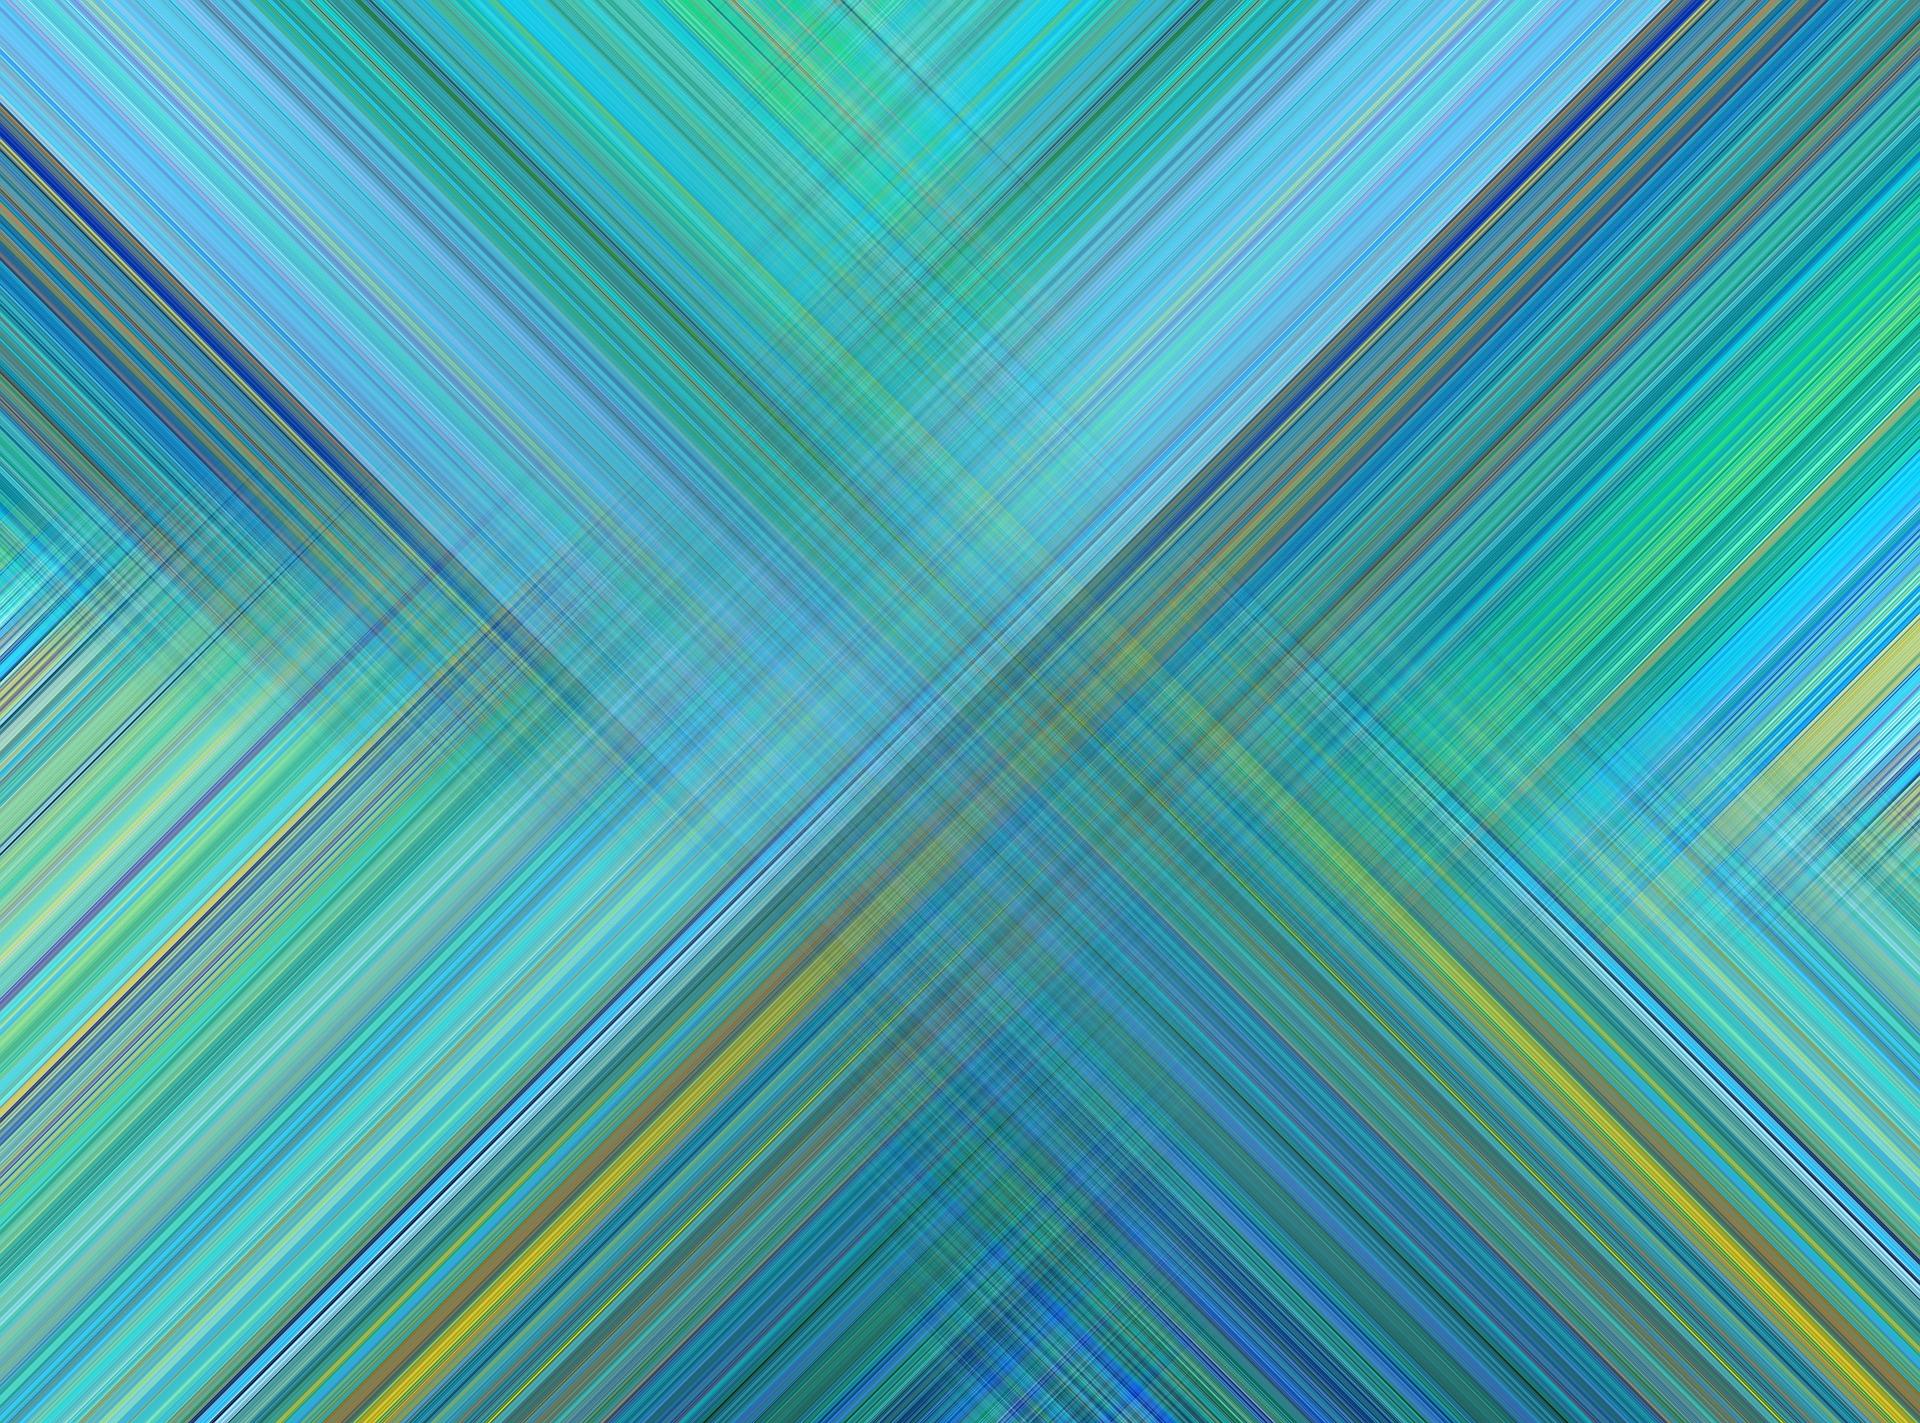 background-2458271_1920